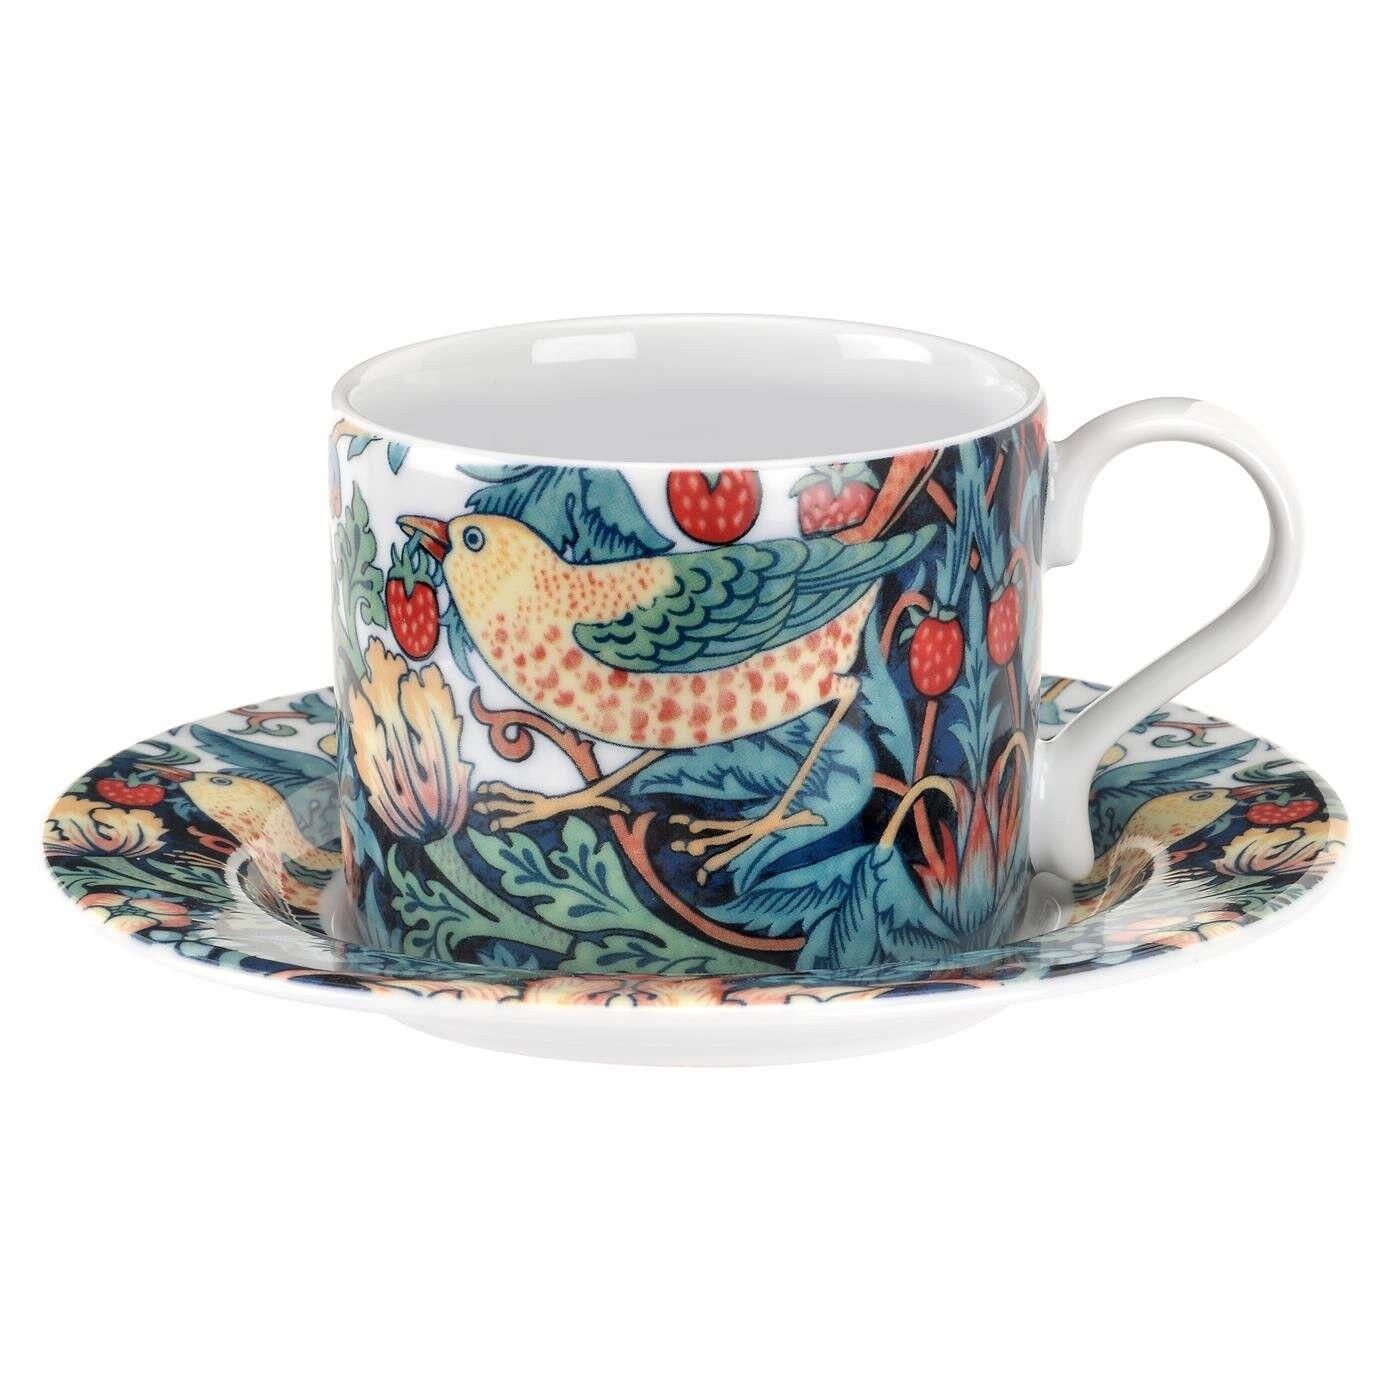 Spode Strawberry Thief Teacup And Saucer Set, 28 cl